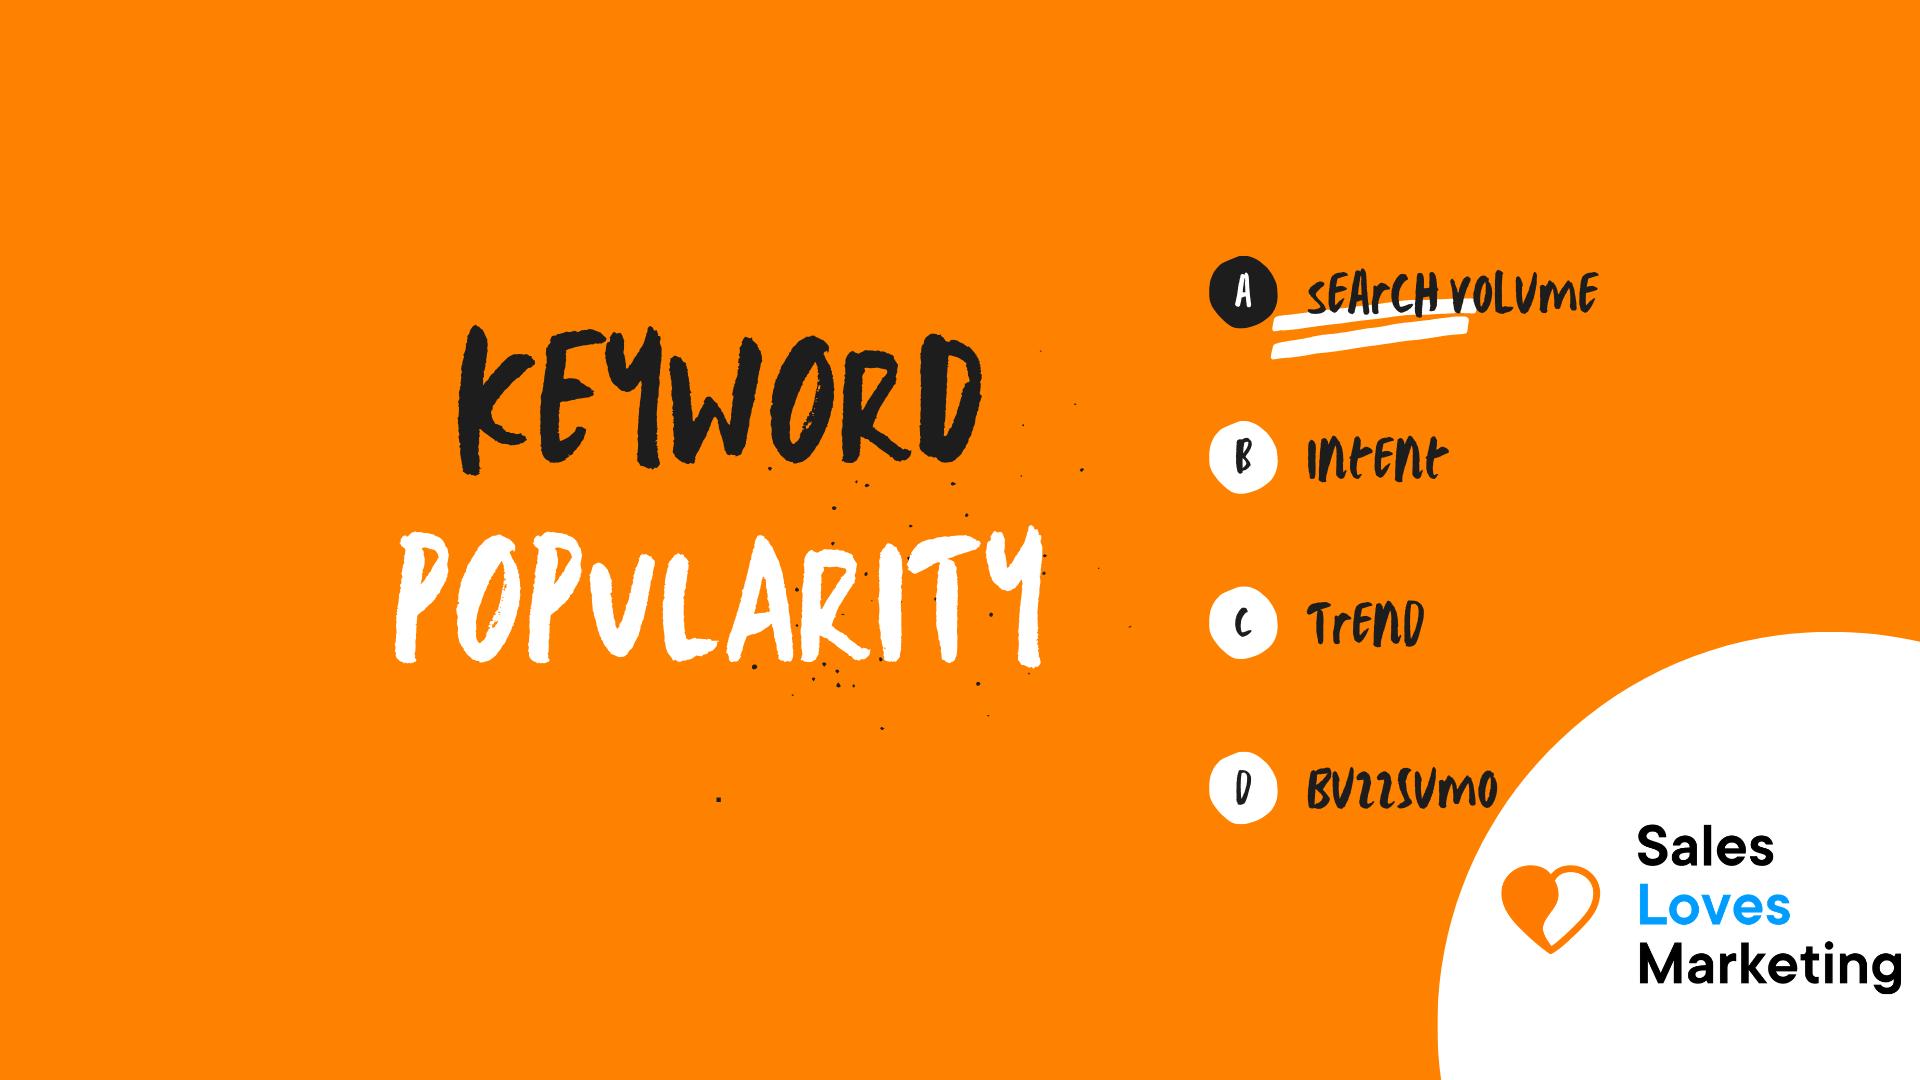 Keyword Popularity